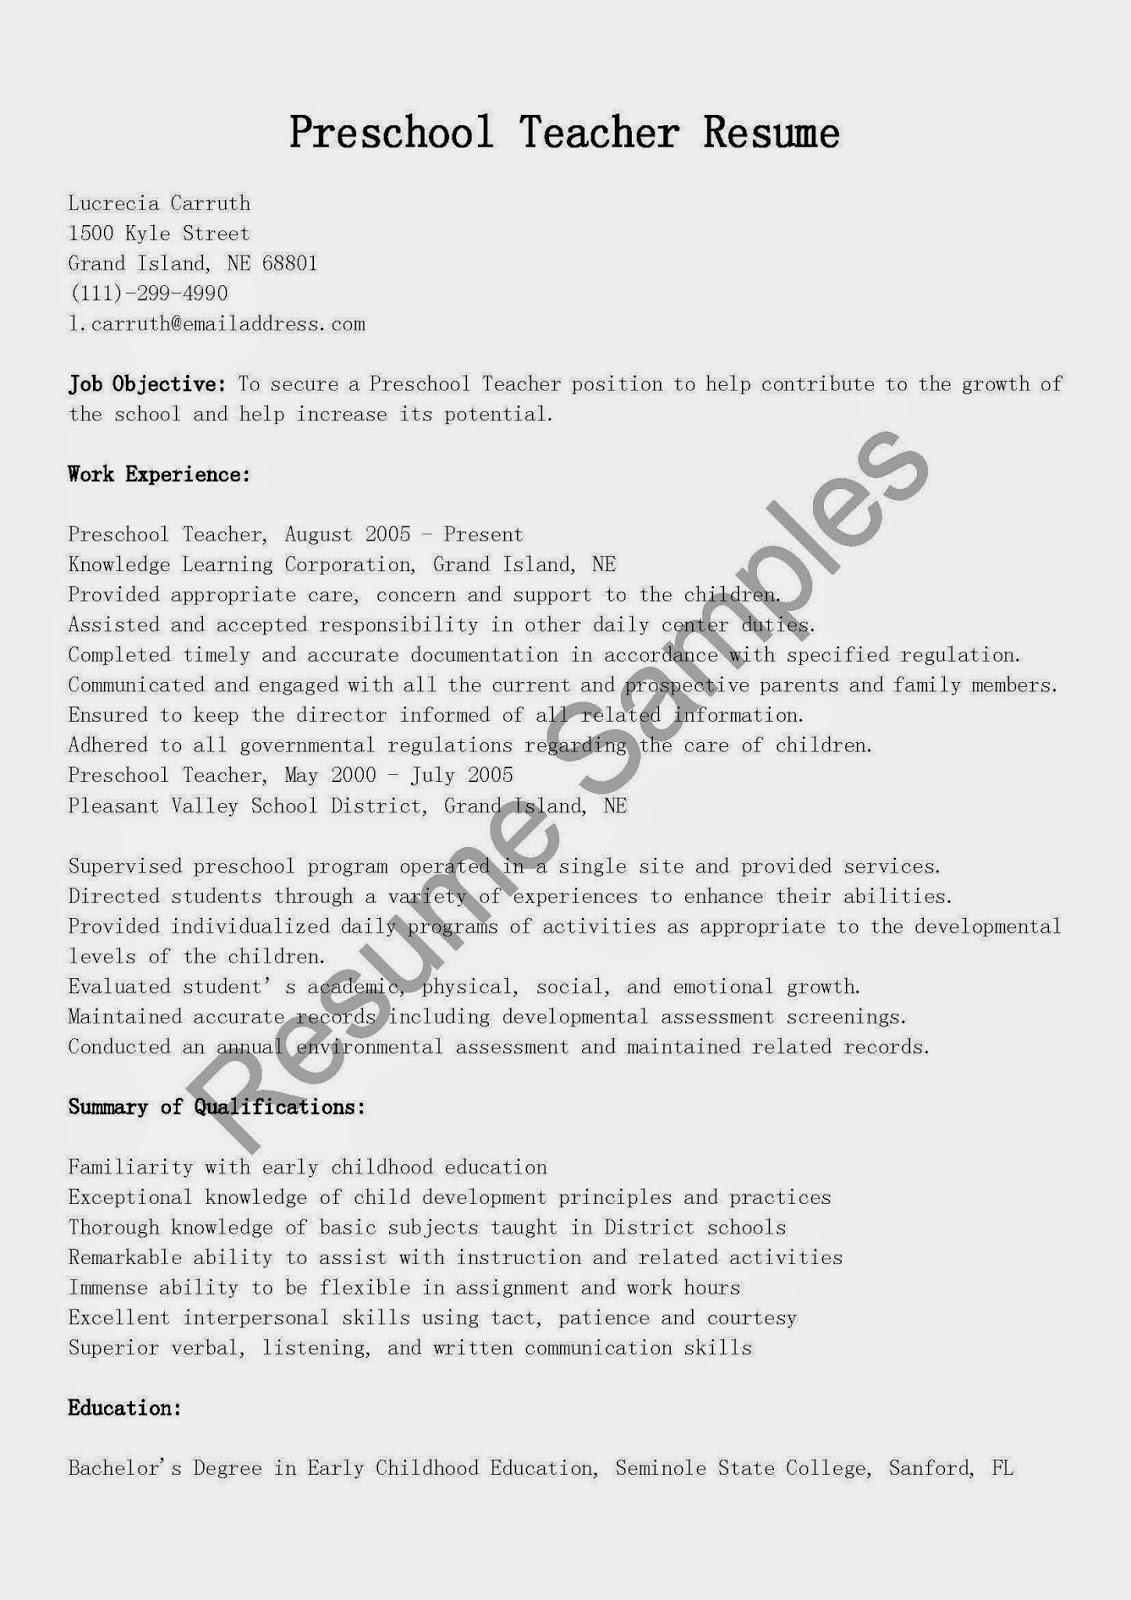 Preschool Teacher Resume Sample – Preschool Teacher Resume